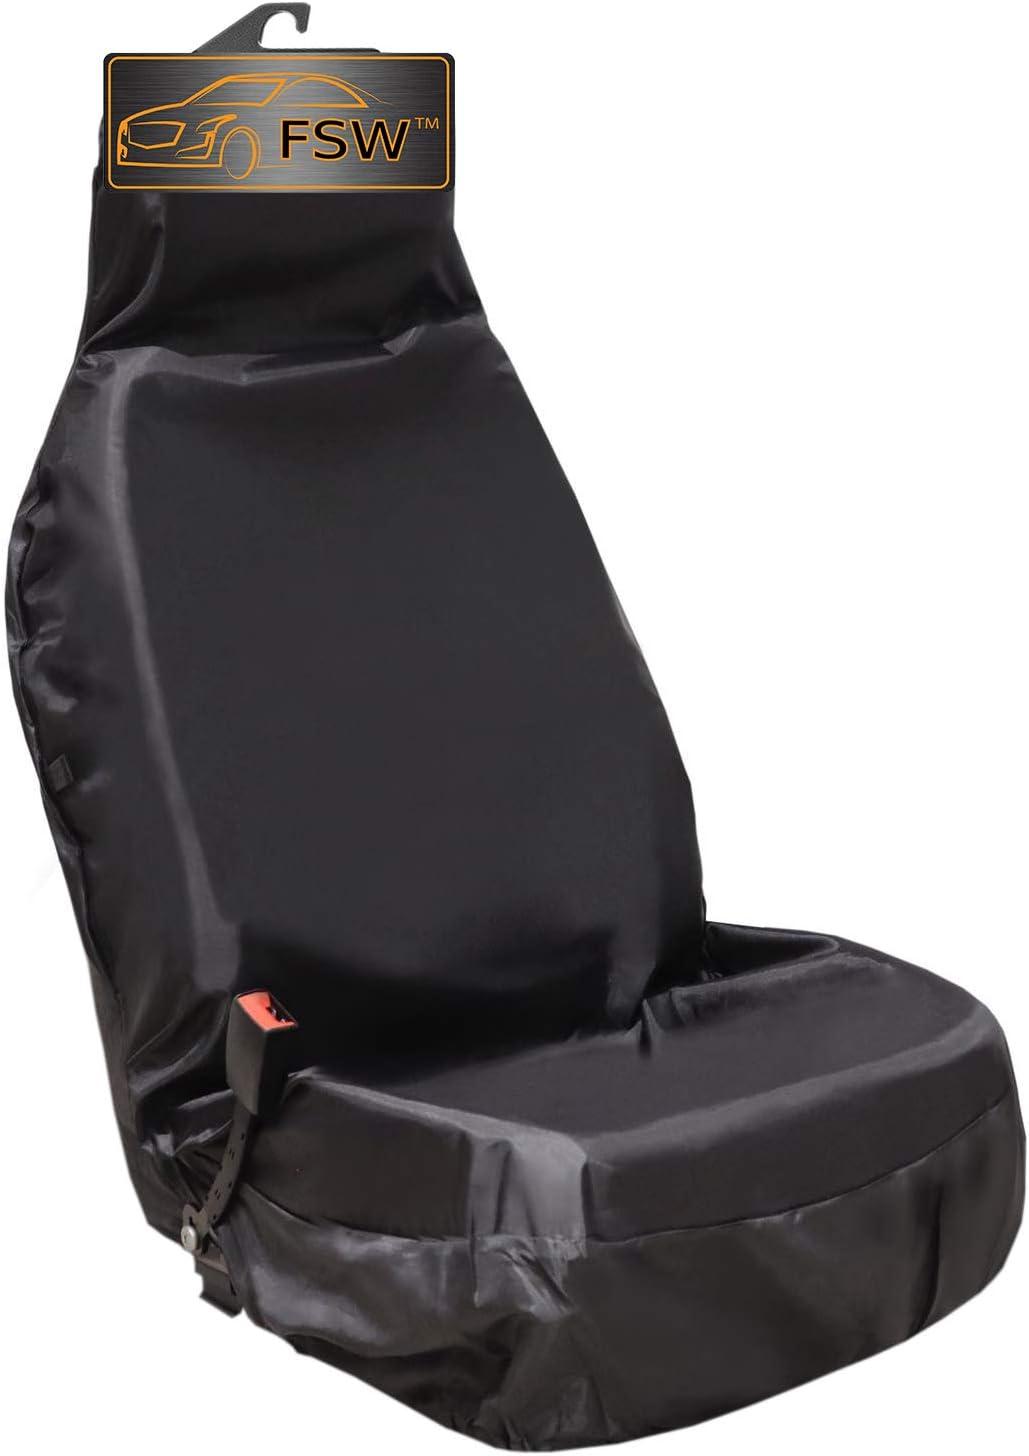 V8 FSW HD1+1 Black Heavy Duty Waterproof Car Black Seat Covers 1+1 Black HD1+1BLACK36 Fits: Cerberra Griffith Typhoon Tamara T400 T350 T440 Chimaera Sagaris Tuscan